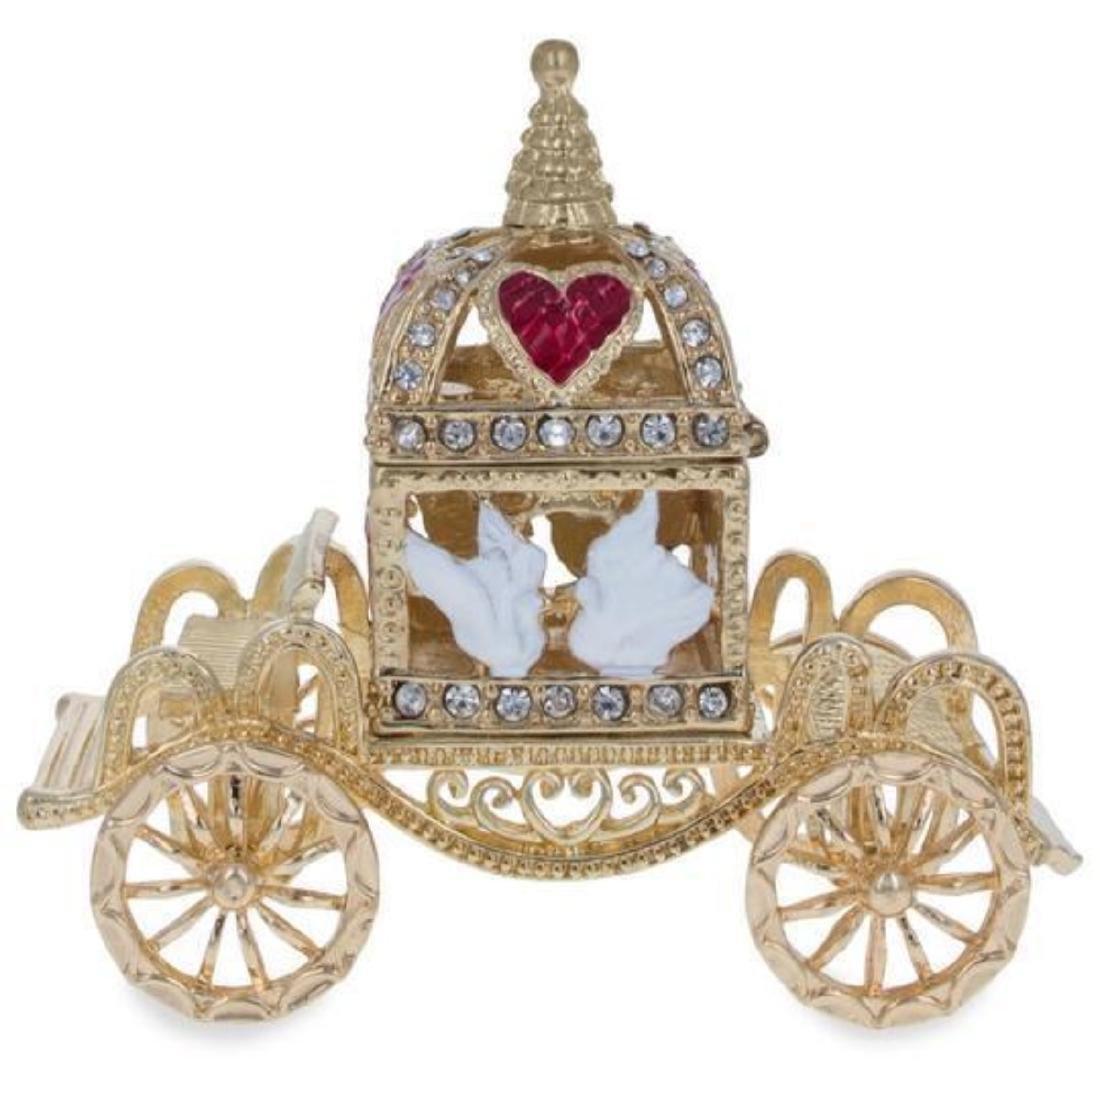 Royal Coronation Coach with Doves Trinket Box Figurine - 2